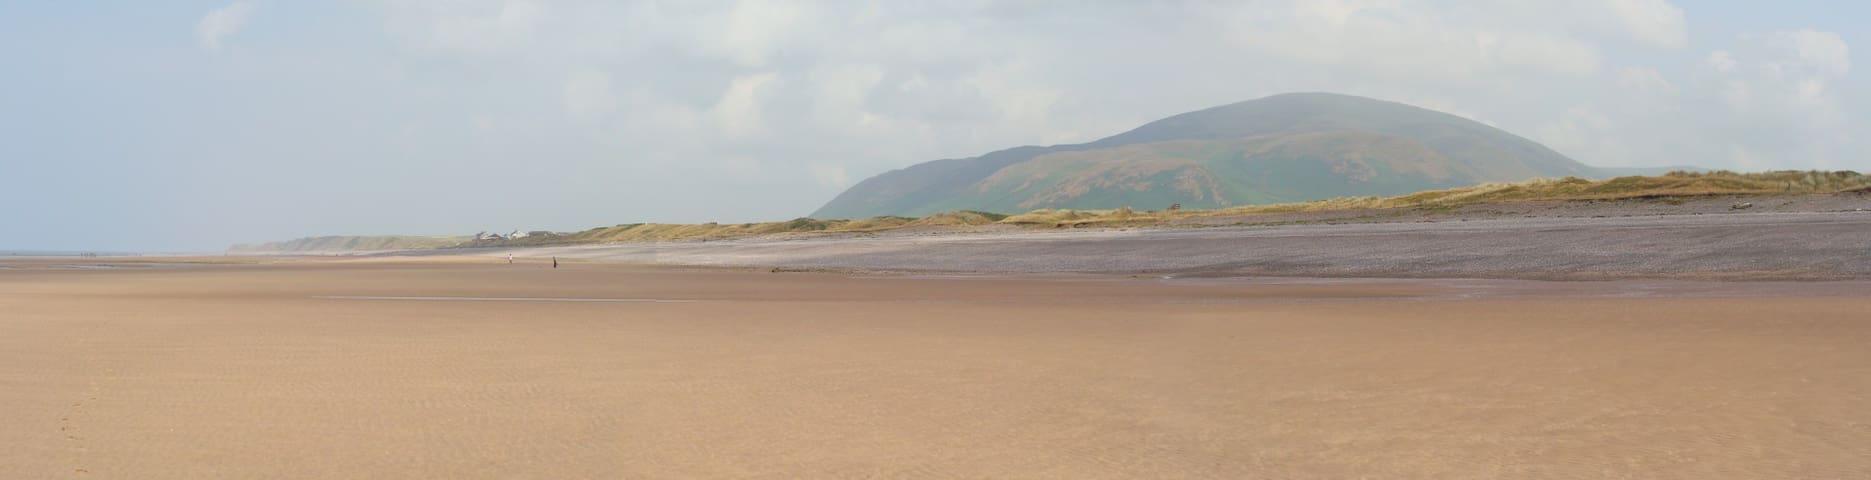 Beach at Layriggs Kirksanton overlooking Black Combe